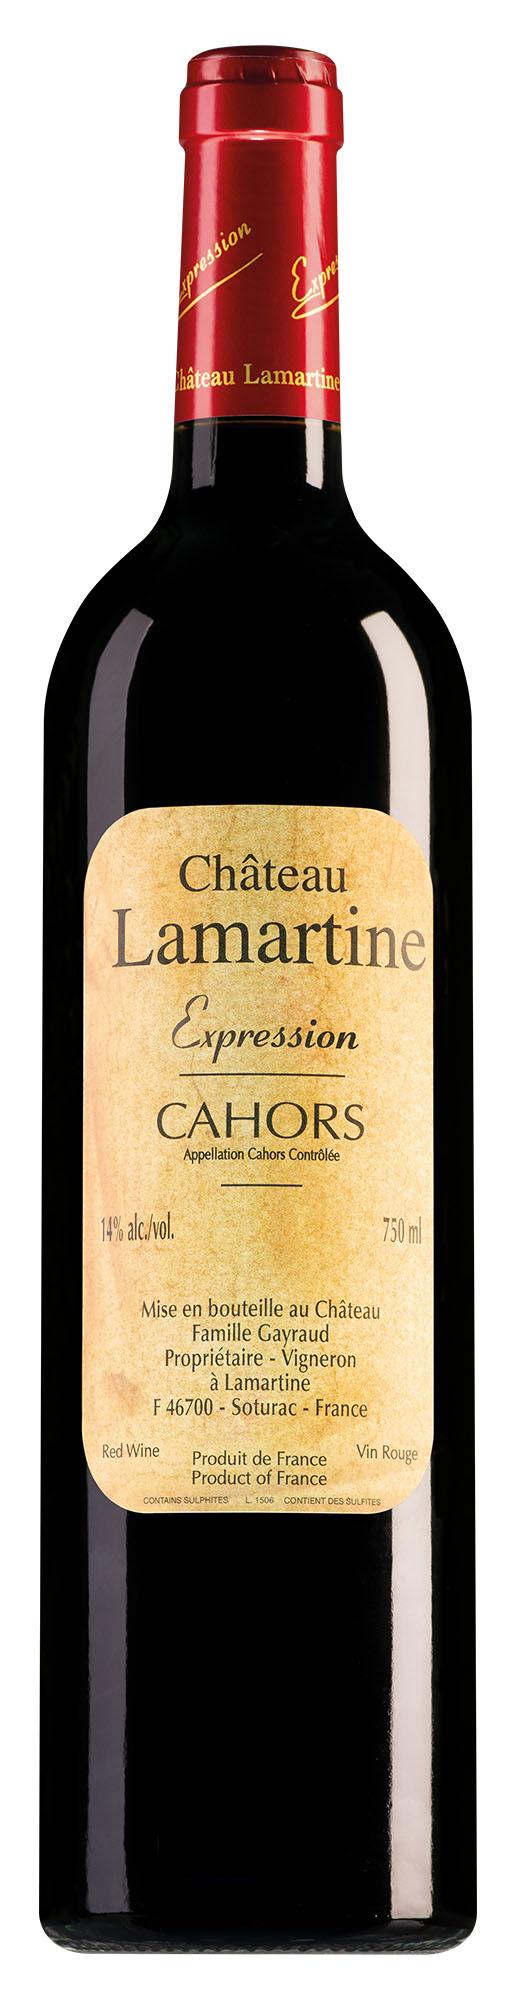 Château Lamartine Cahors Expression